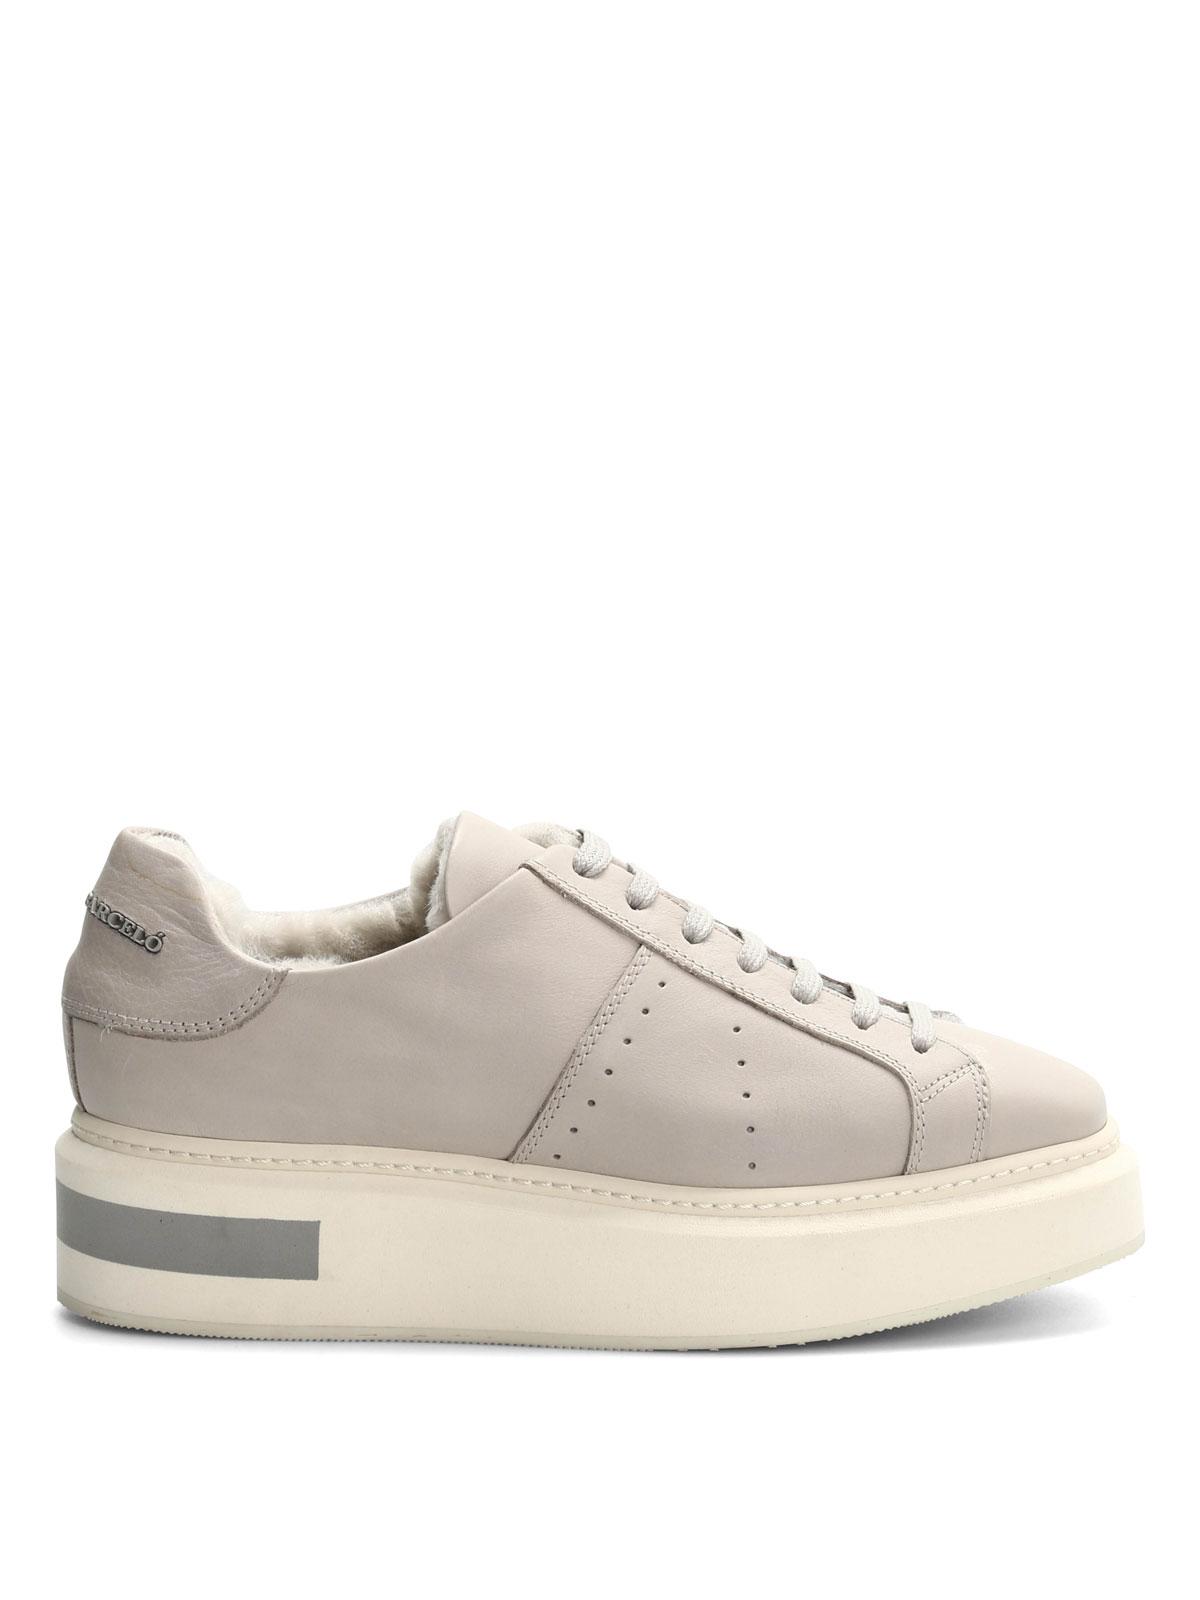 new concept 51106 06dd0 Manuel Barcelo' - Trafalgar nappa low sneakers - trainers ...